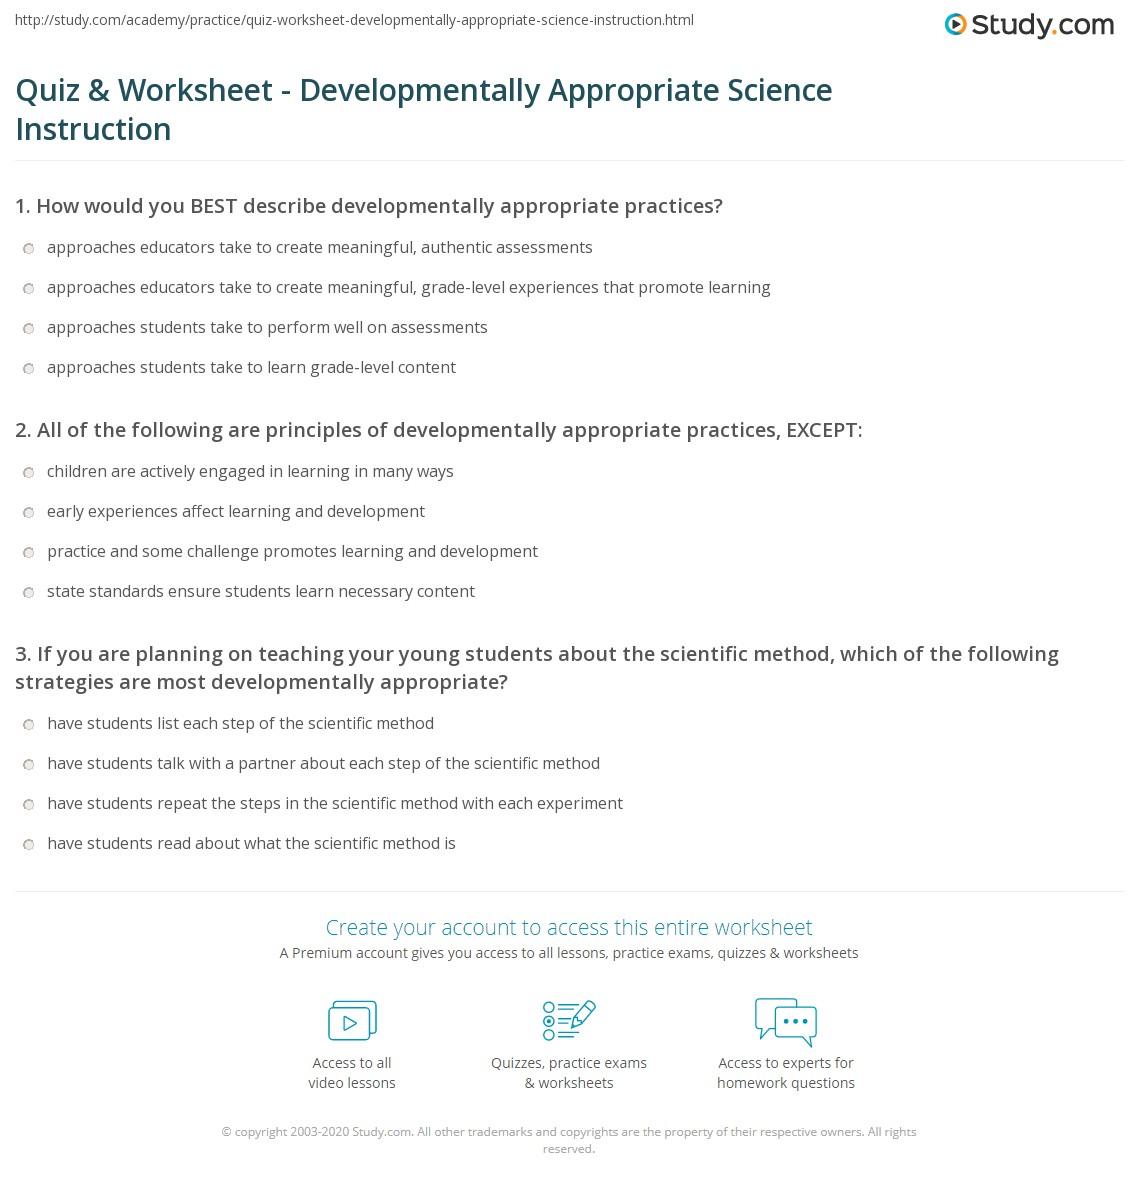 Quiz & Worksheet - Developmentally Appropriate Science ...